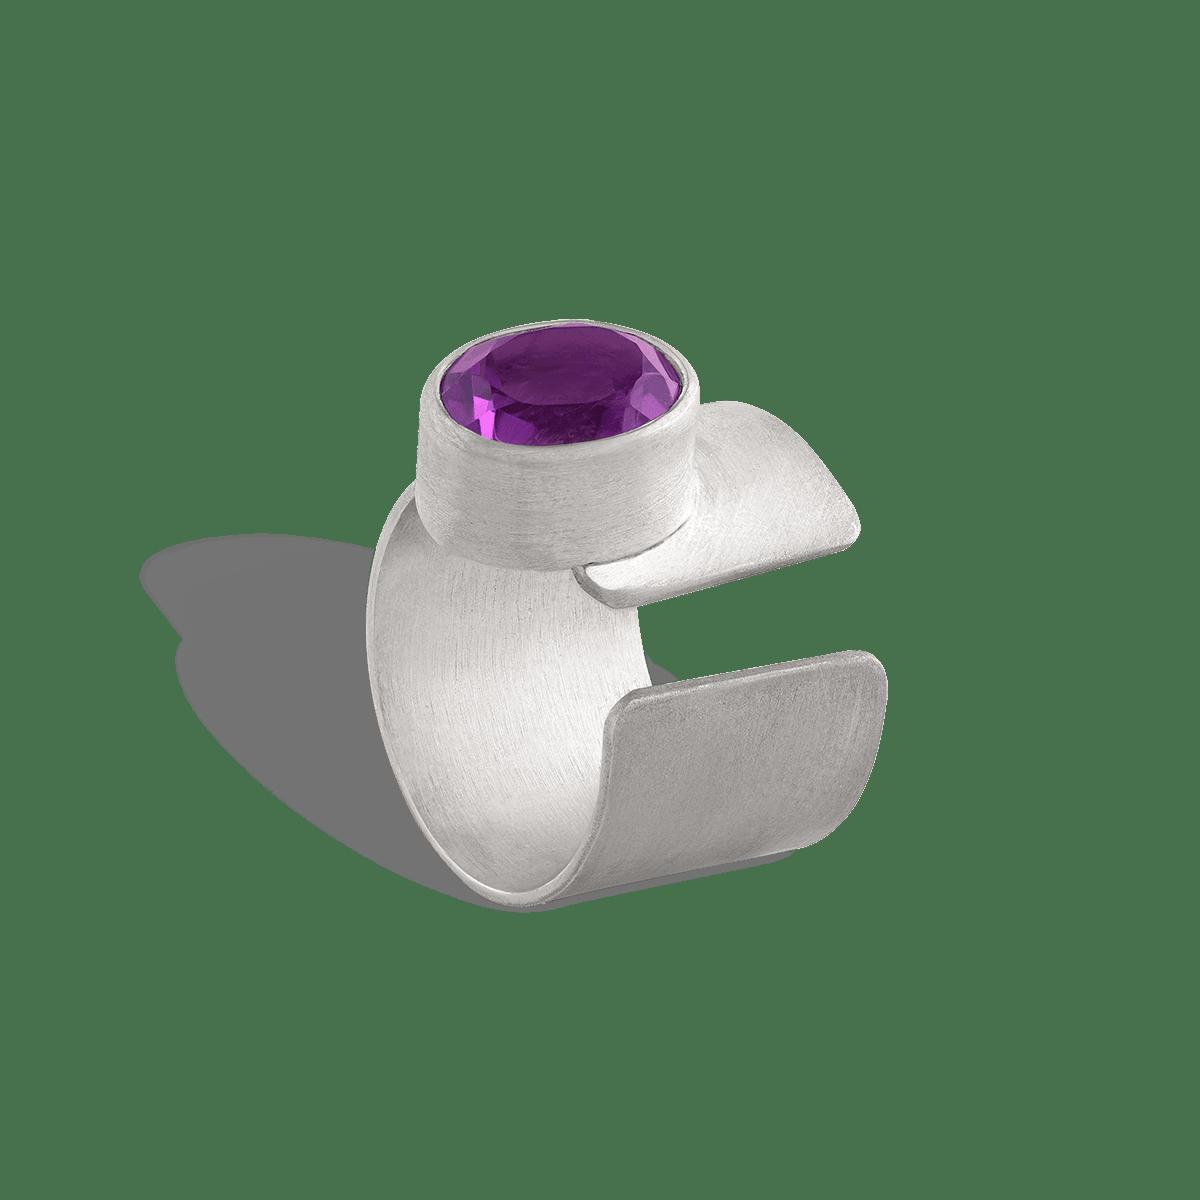 انگشتر نقره آمیتیس Amitis